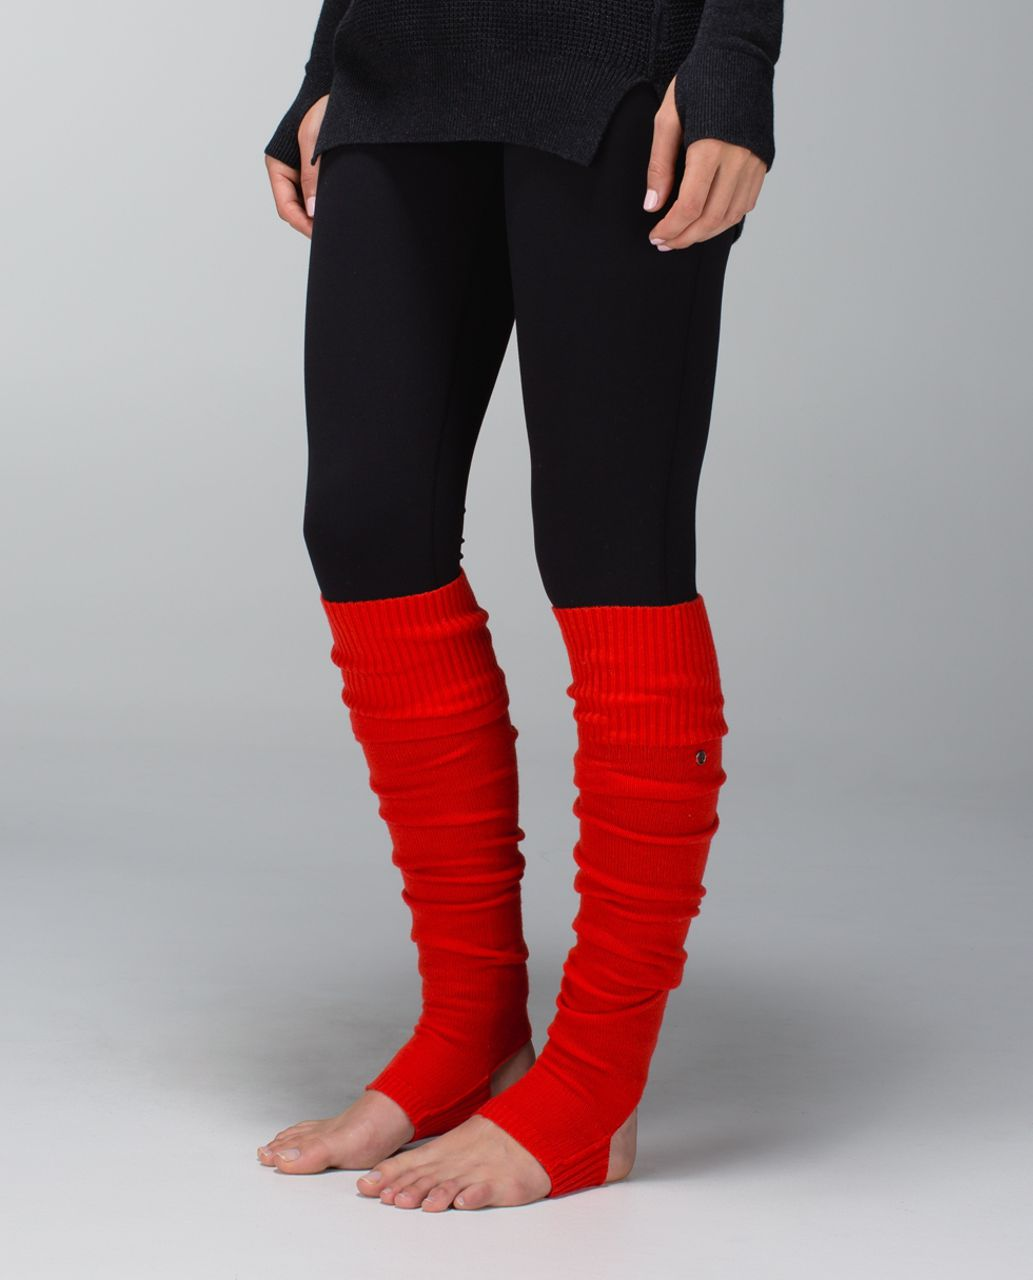 Lululemon Evolution Leg Warmers - Flaming Tomato